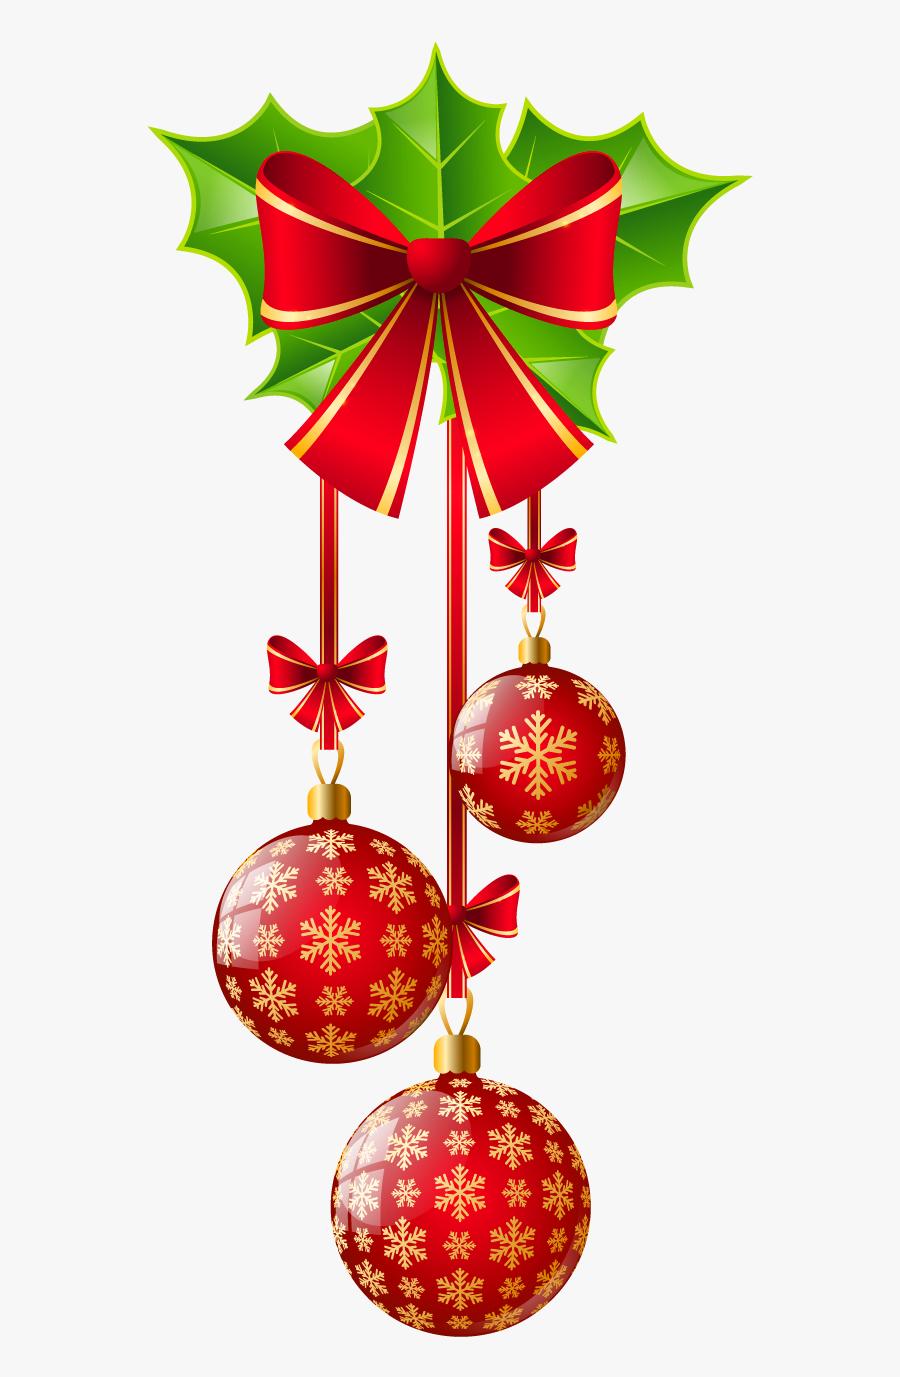 Christmas Ornament Christmas Decoration Clip Art - Christmas Decorations Clipart Png, Transparent Clipart